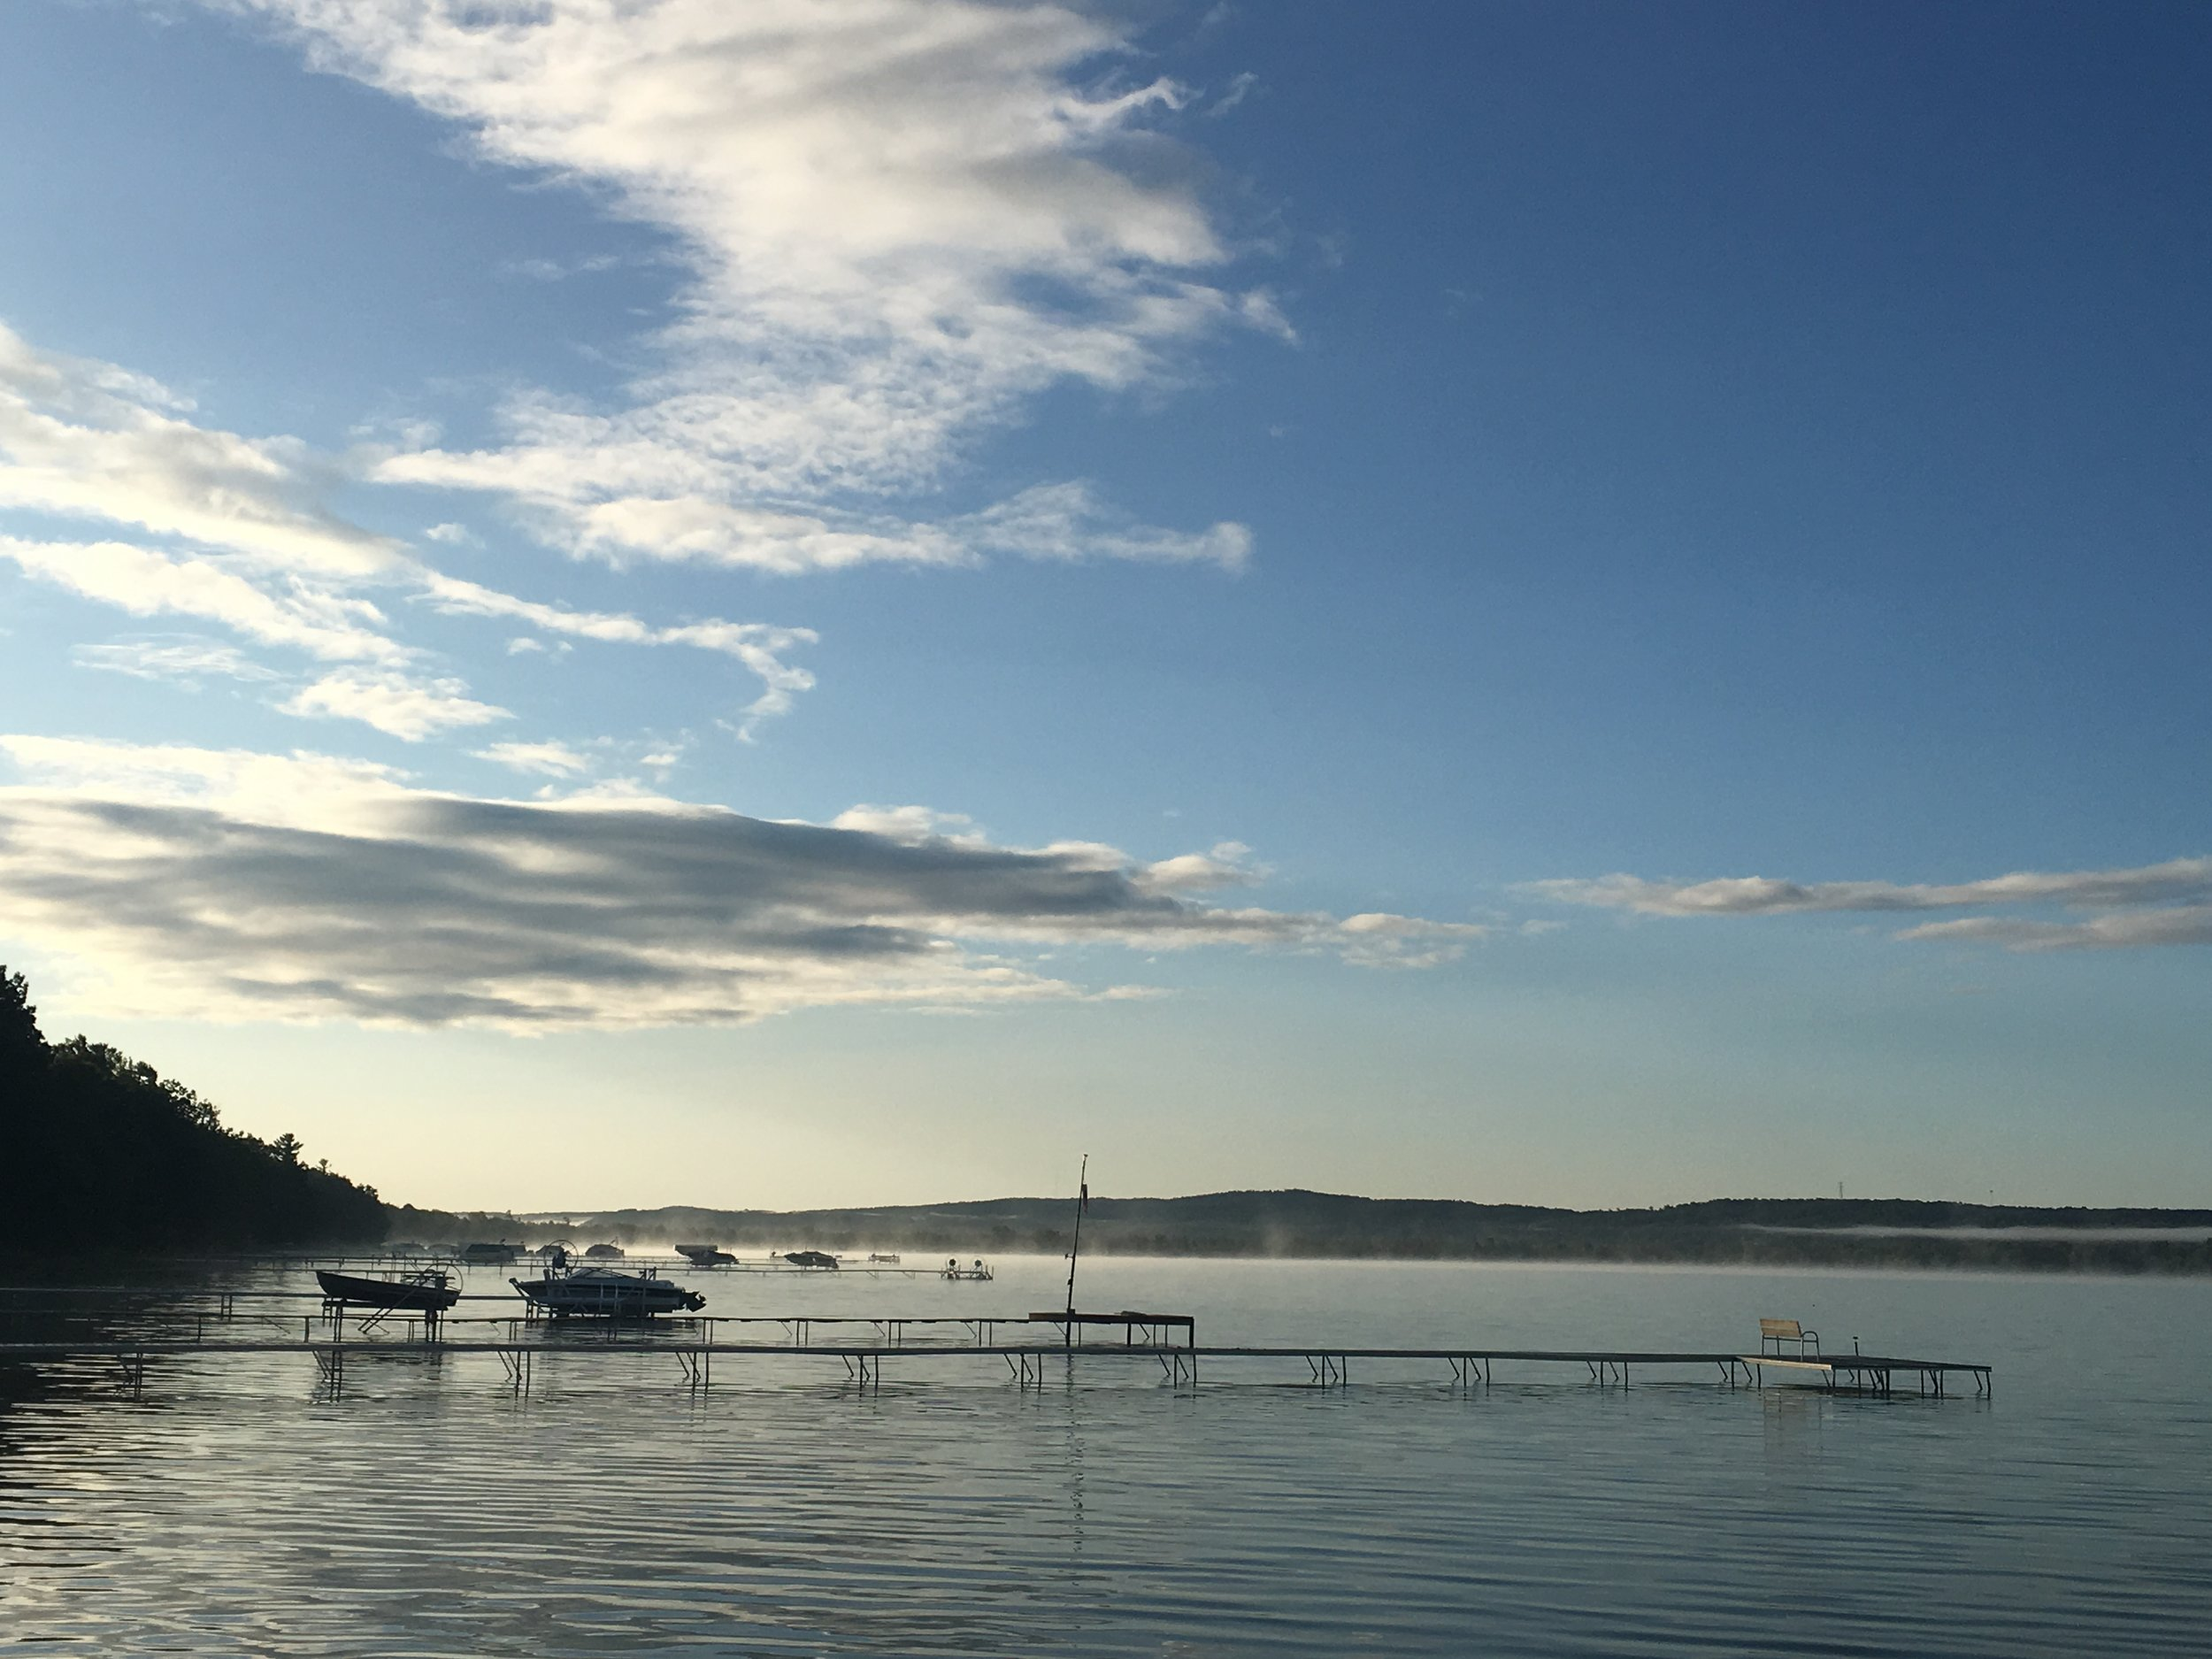 Early morning on Platte Lake